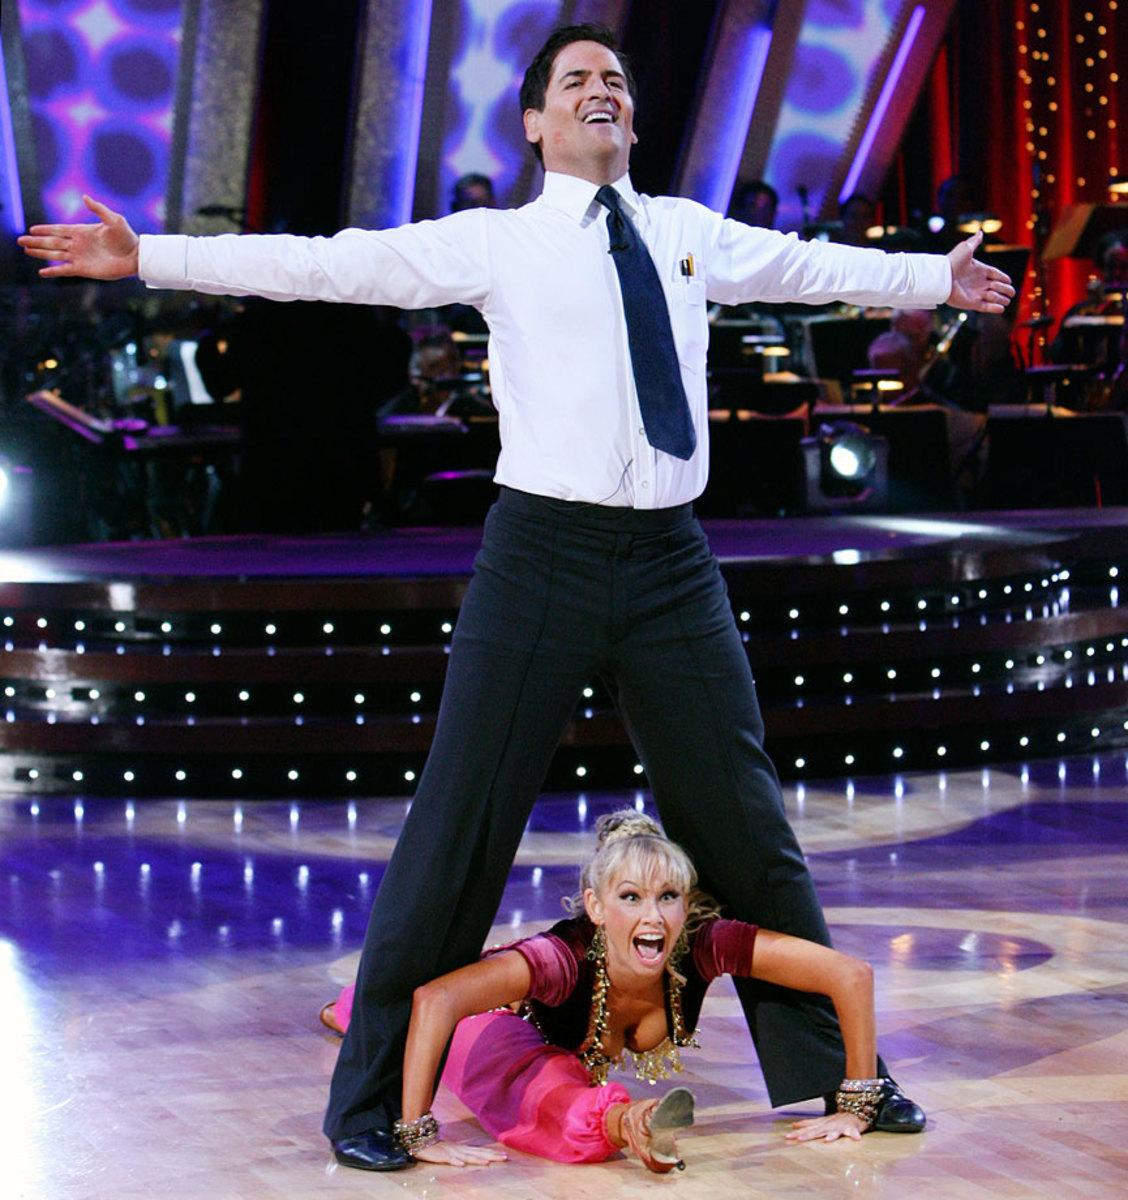 mark-cuban-kym-johnson-dancing-with-the-stars.jpg